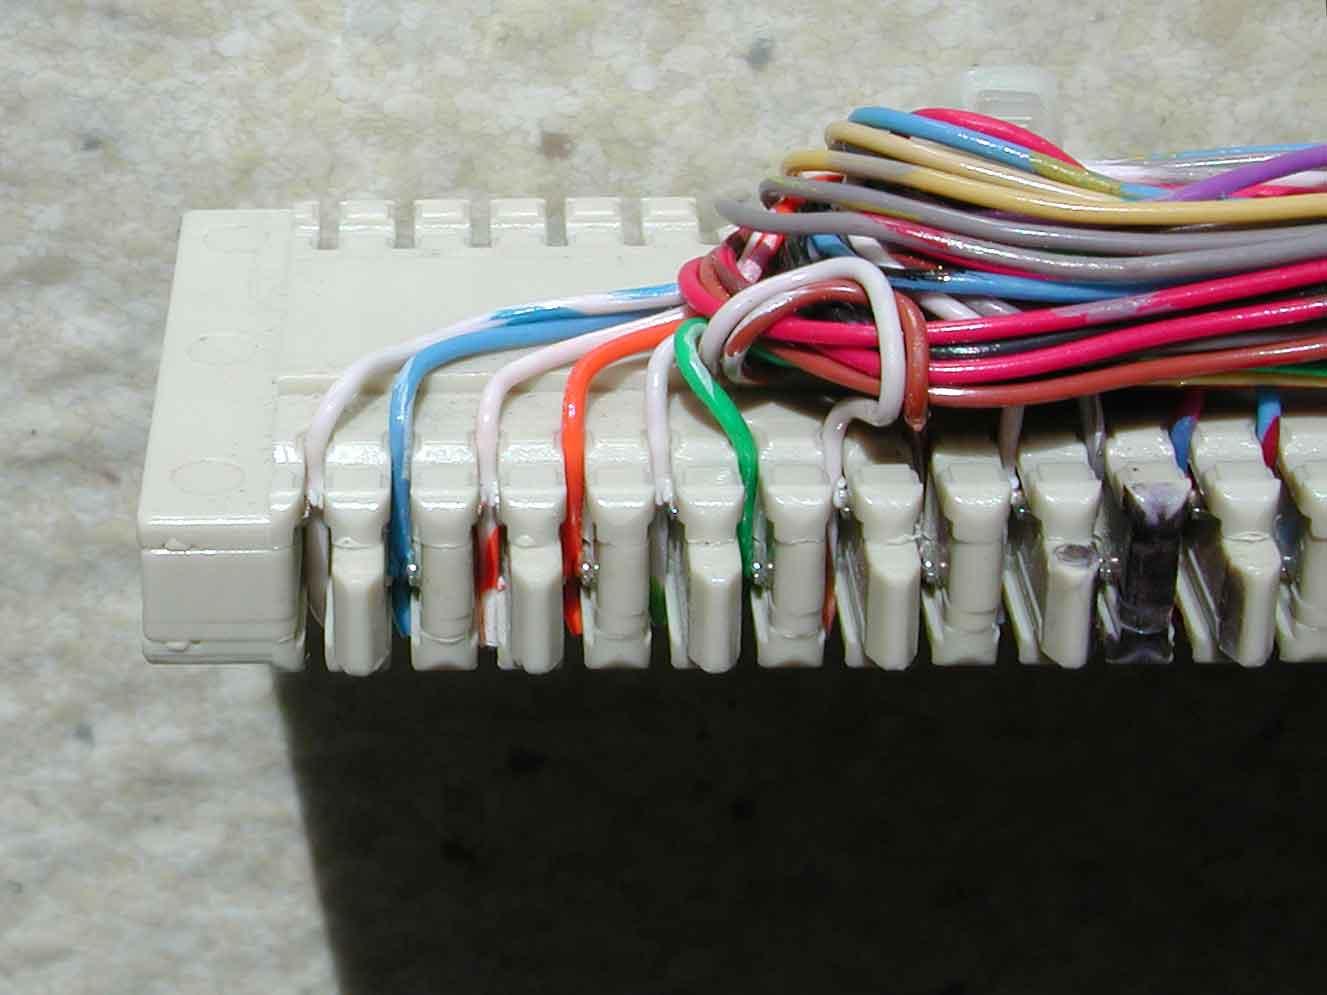 110 Punch Down Wiring Diagram Data Communications Equipment